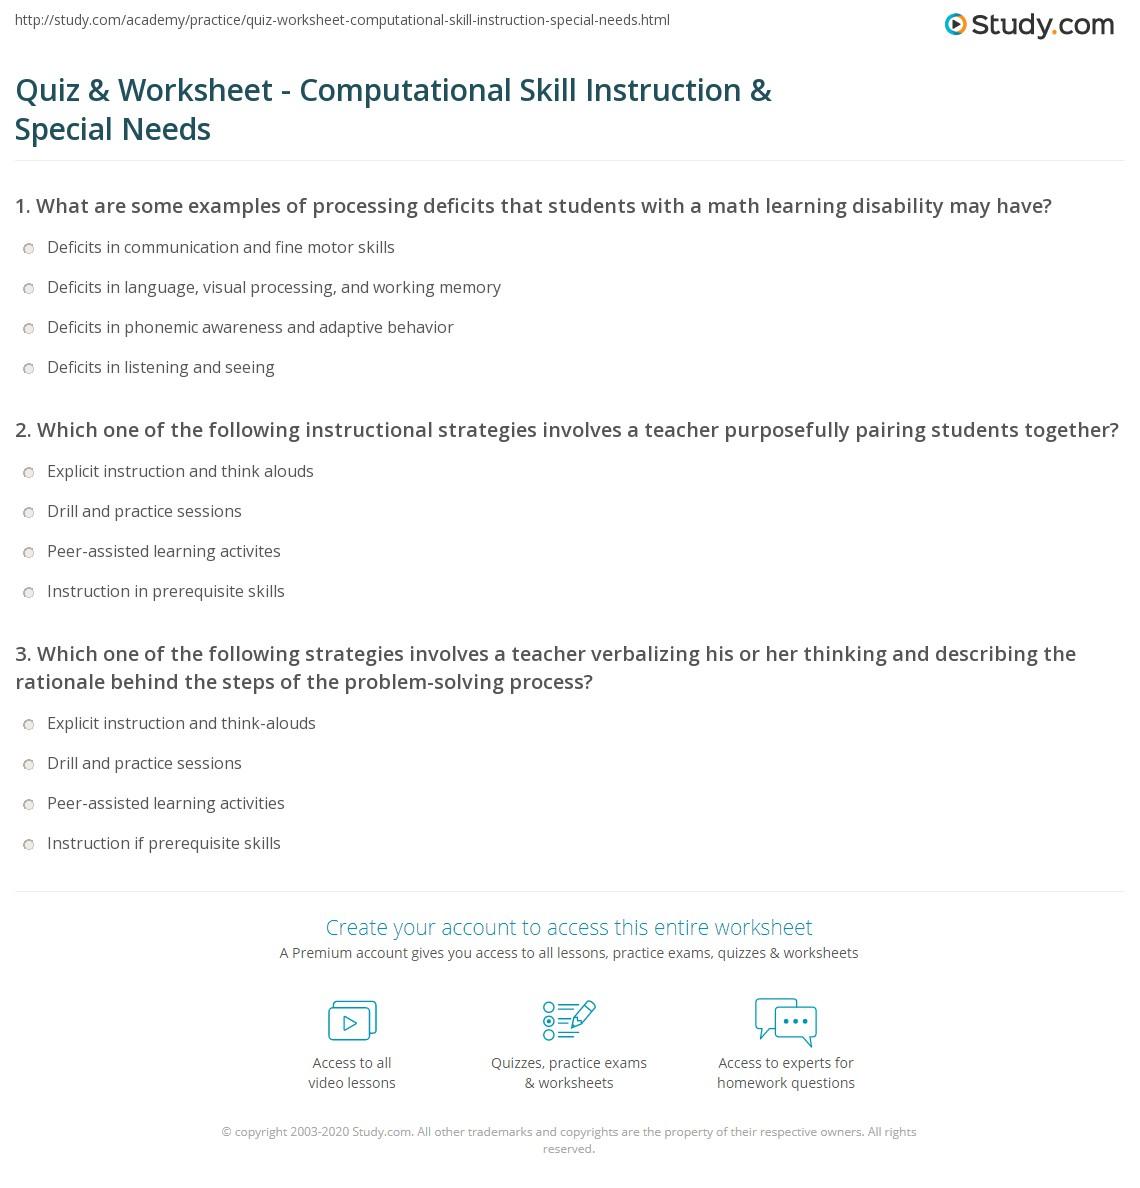 Quiz Worksheet Computational Skill Instruction Special Needs